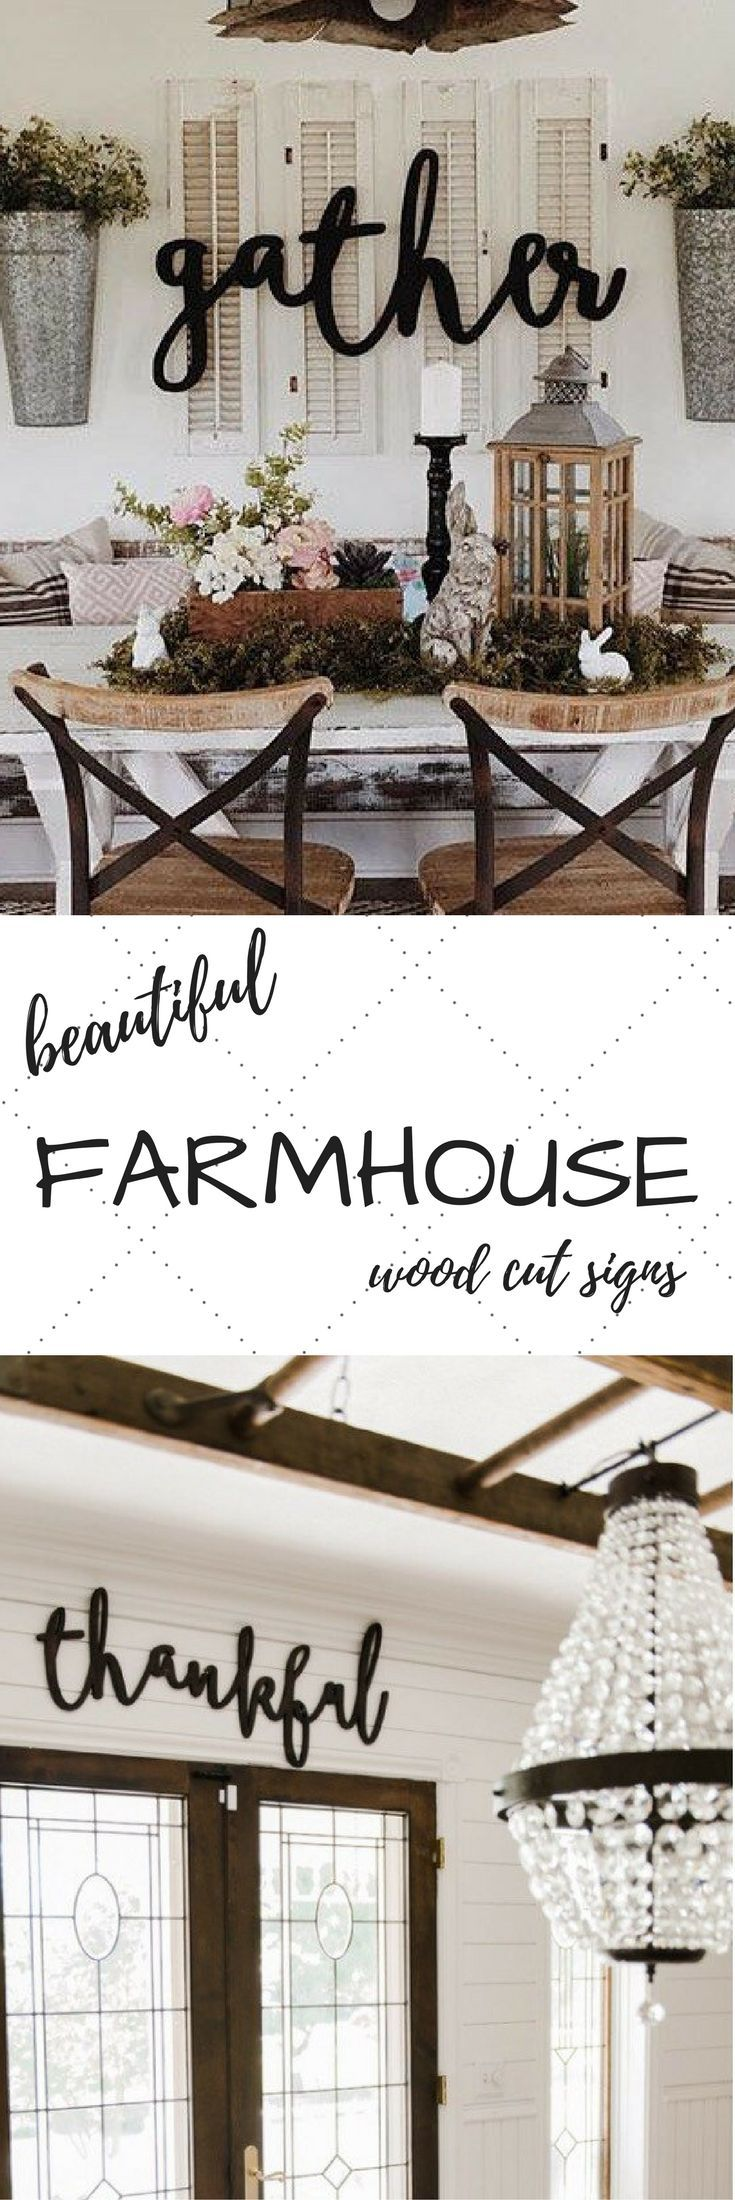 Thankful Word Wood Cut Wall Art Sign Decor   Kitchen living rooms ...